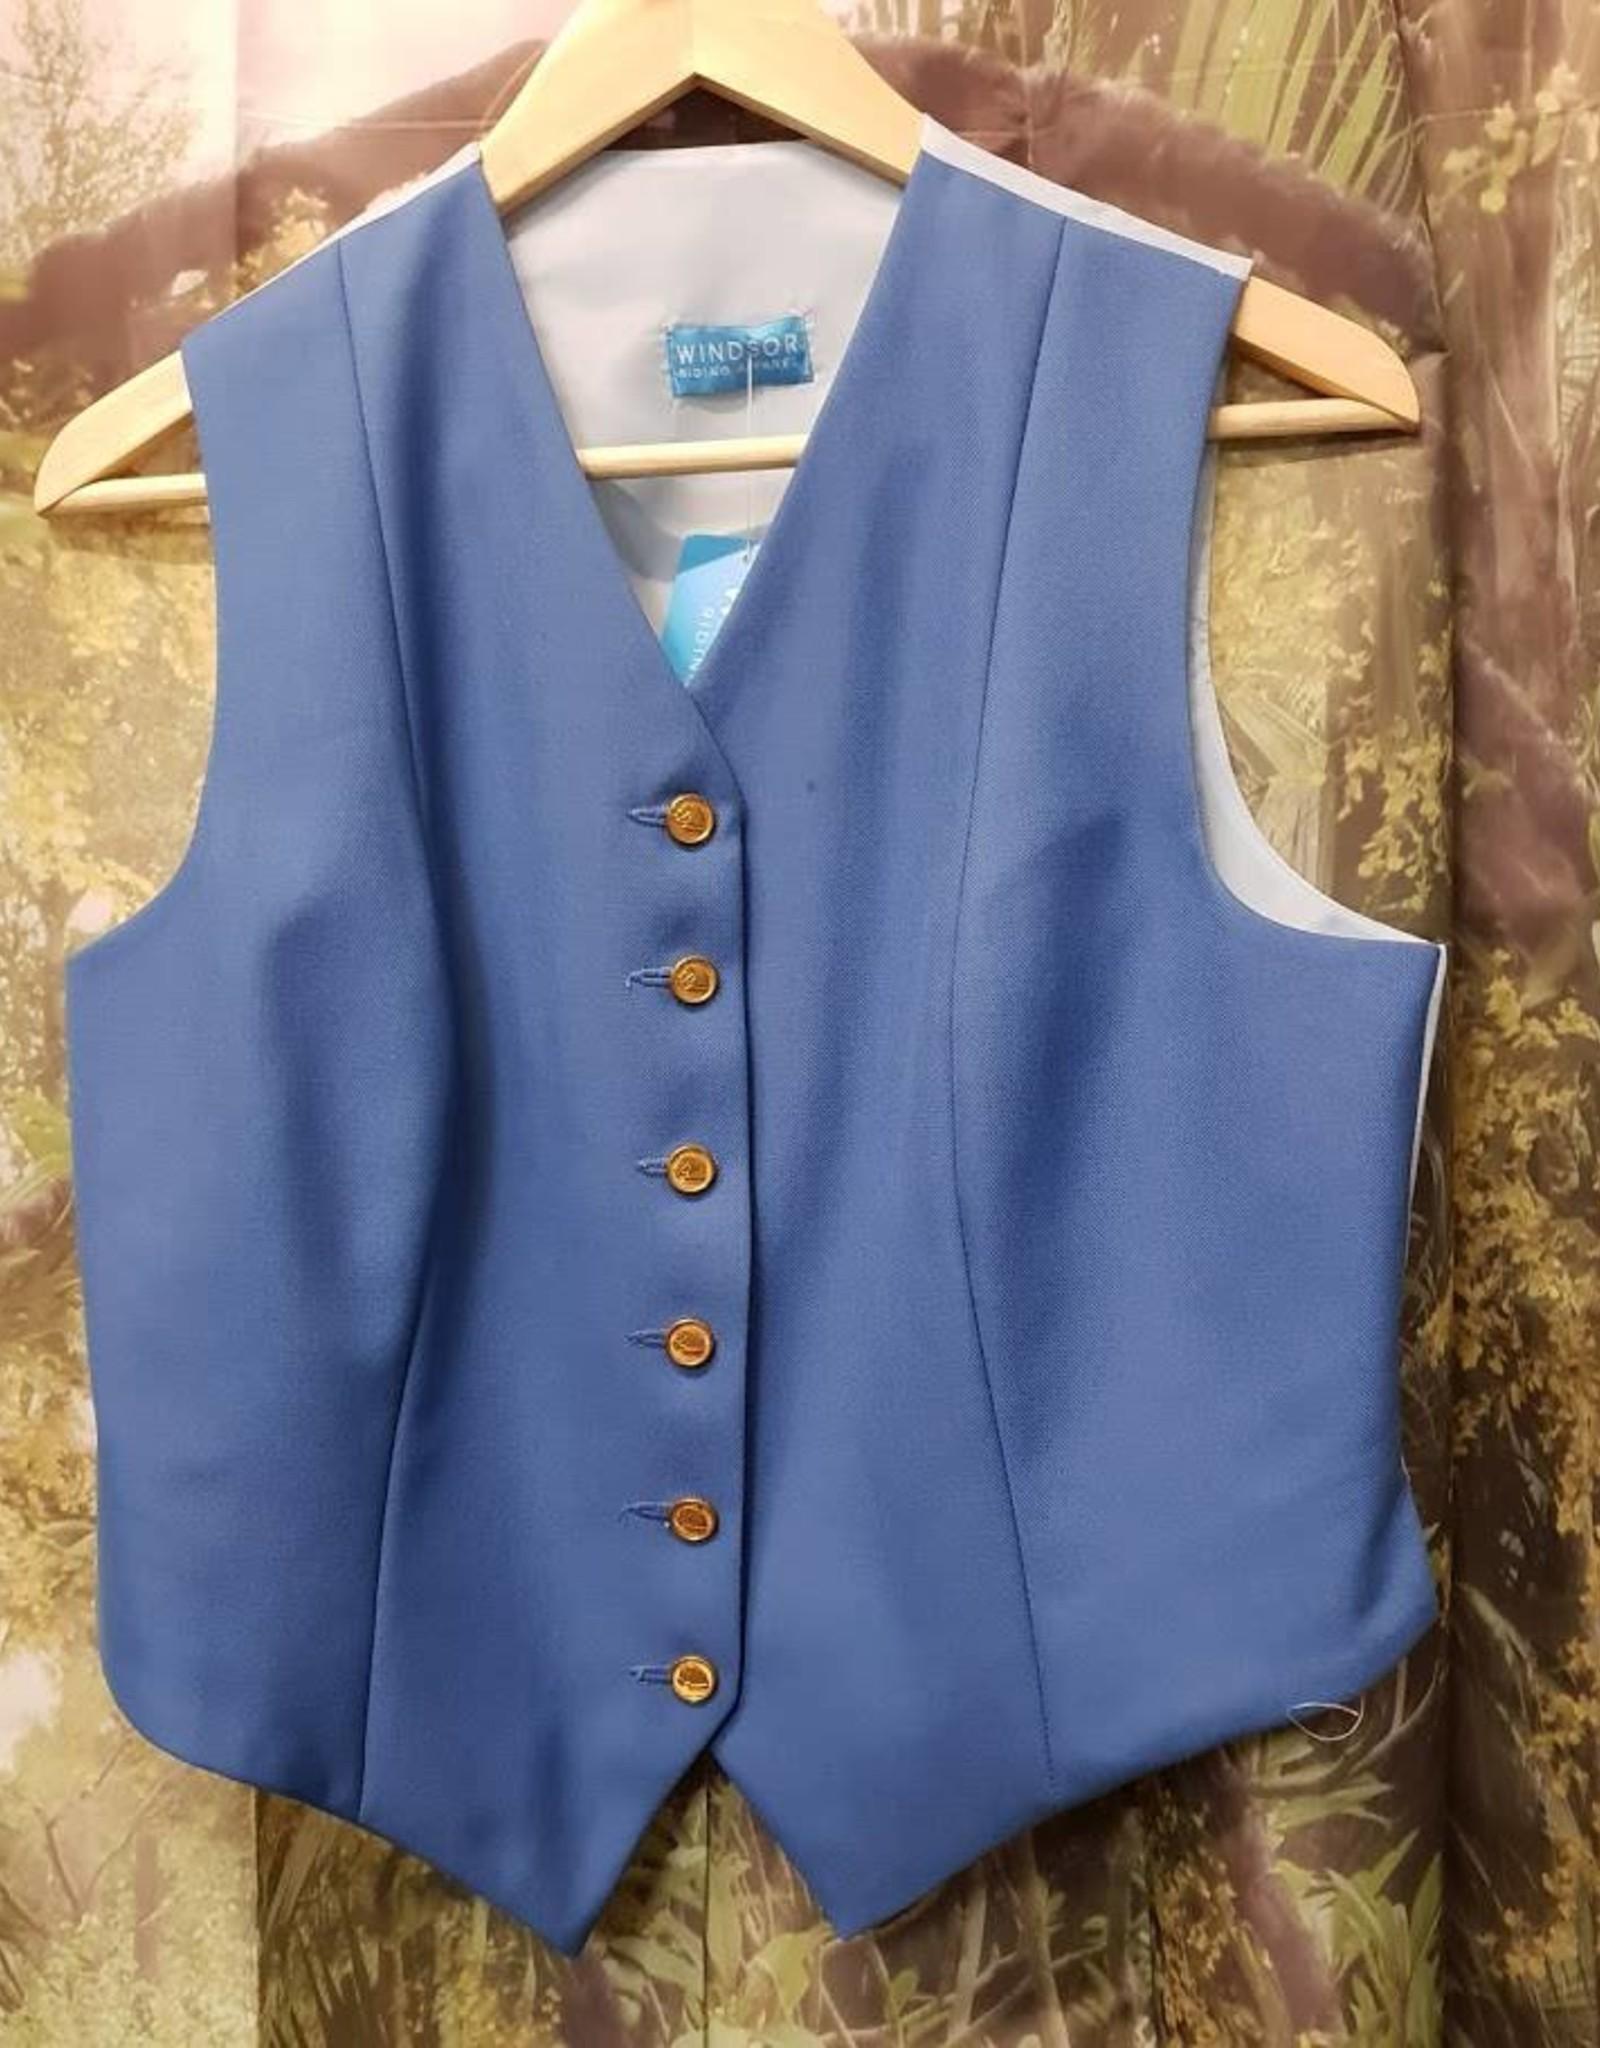 Windsor Apparel Ladies Vest - Cornflower Blue - Size 16